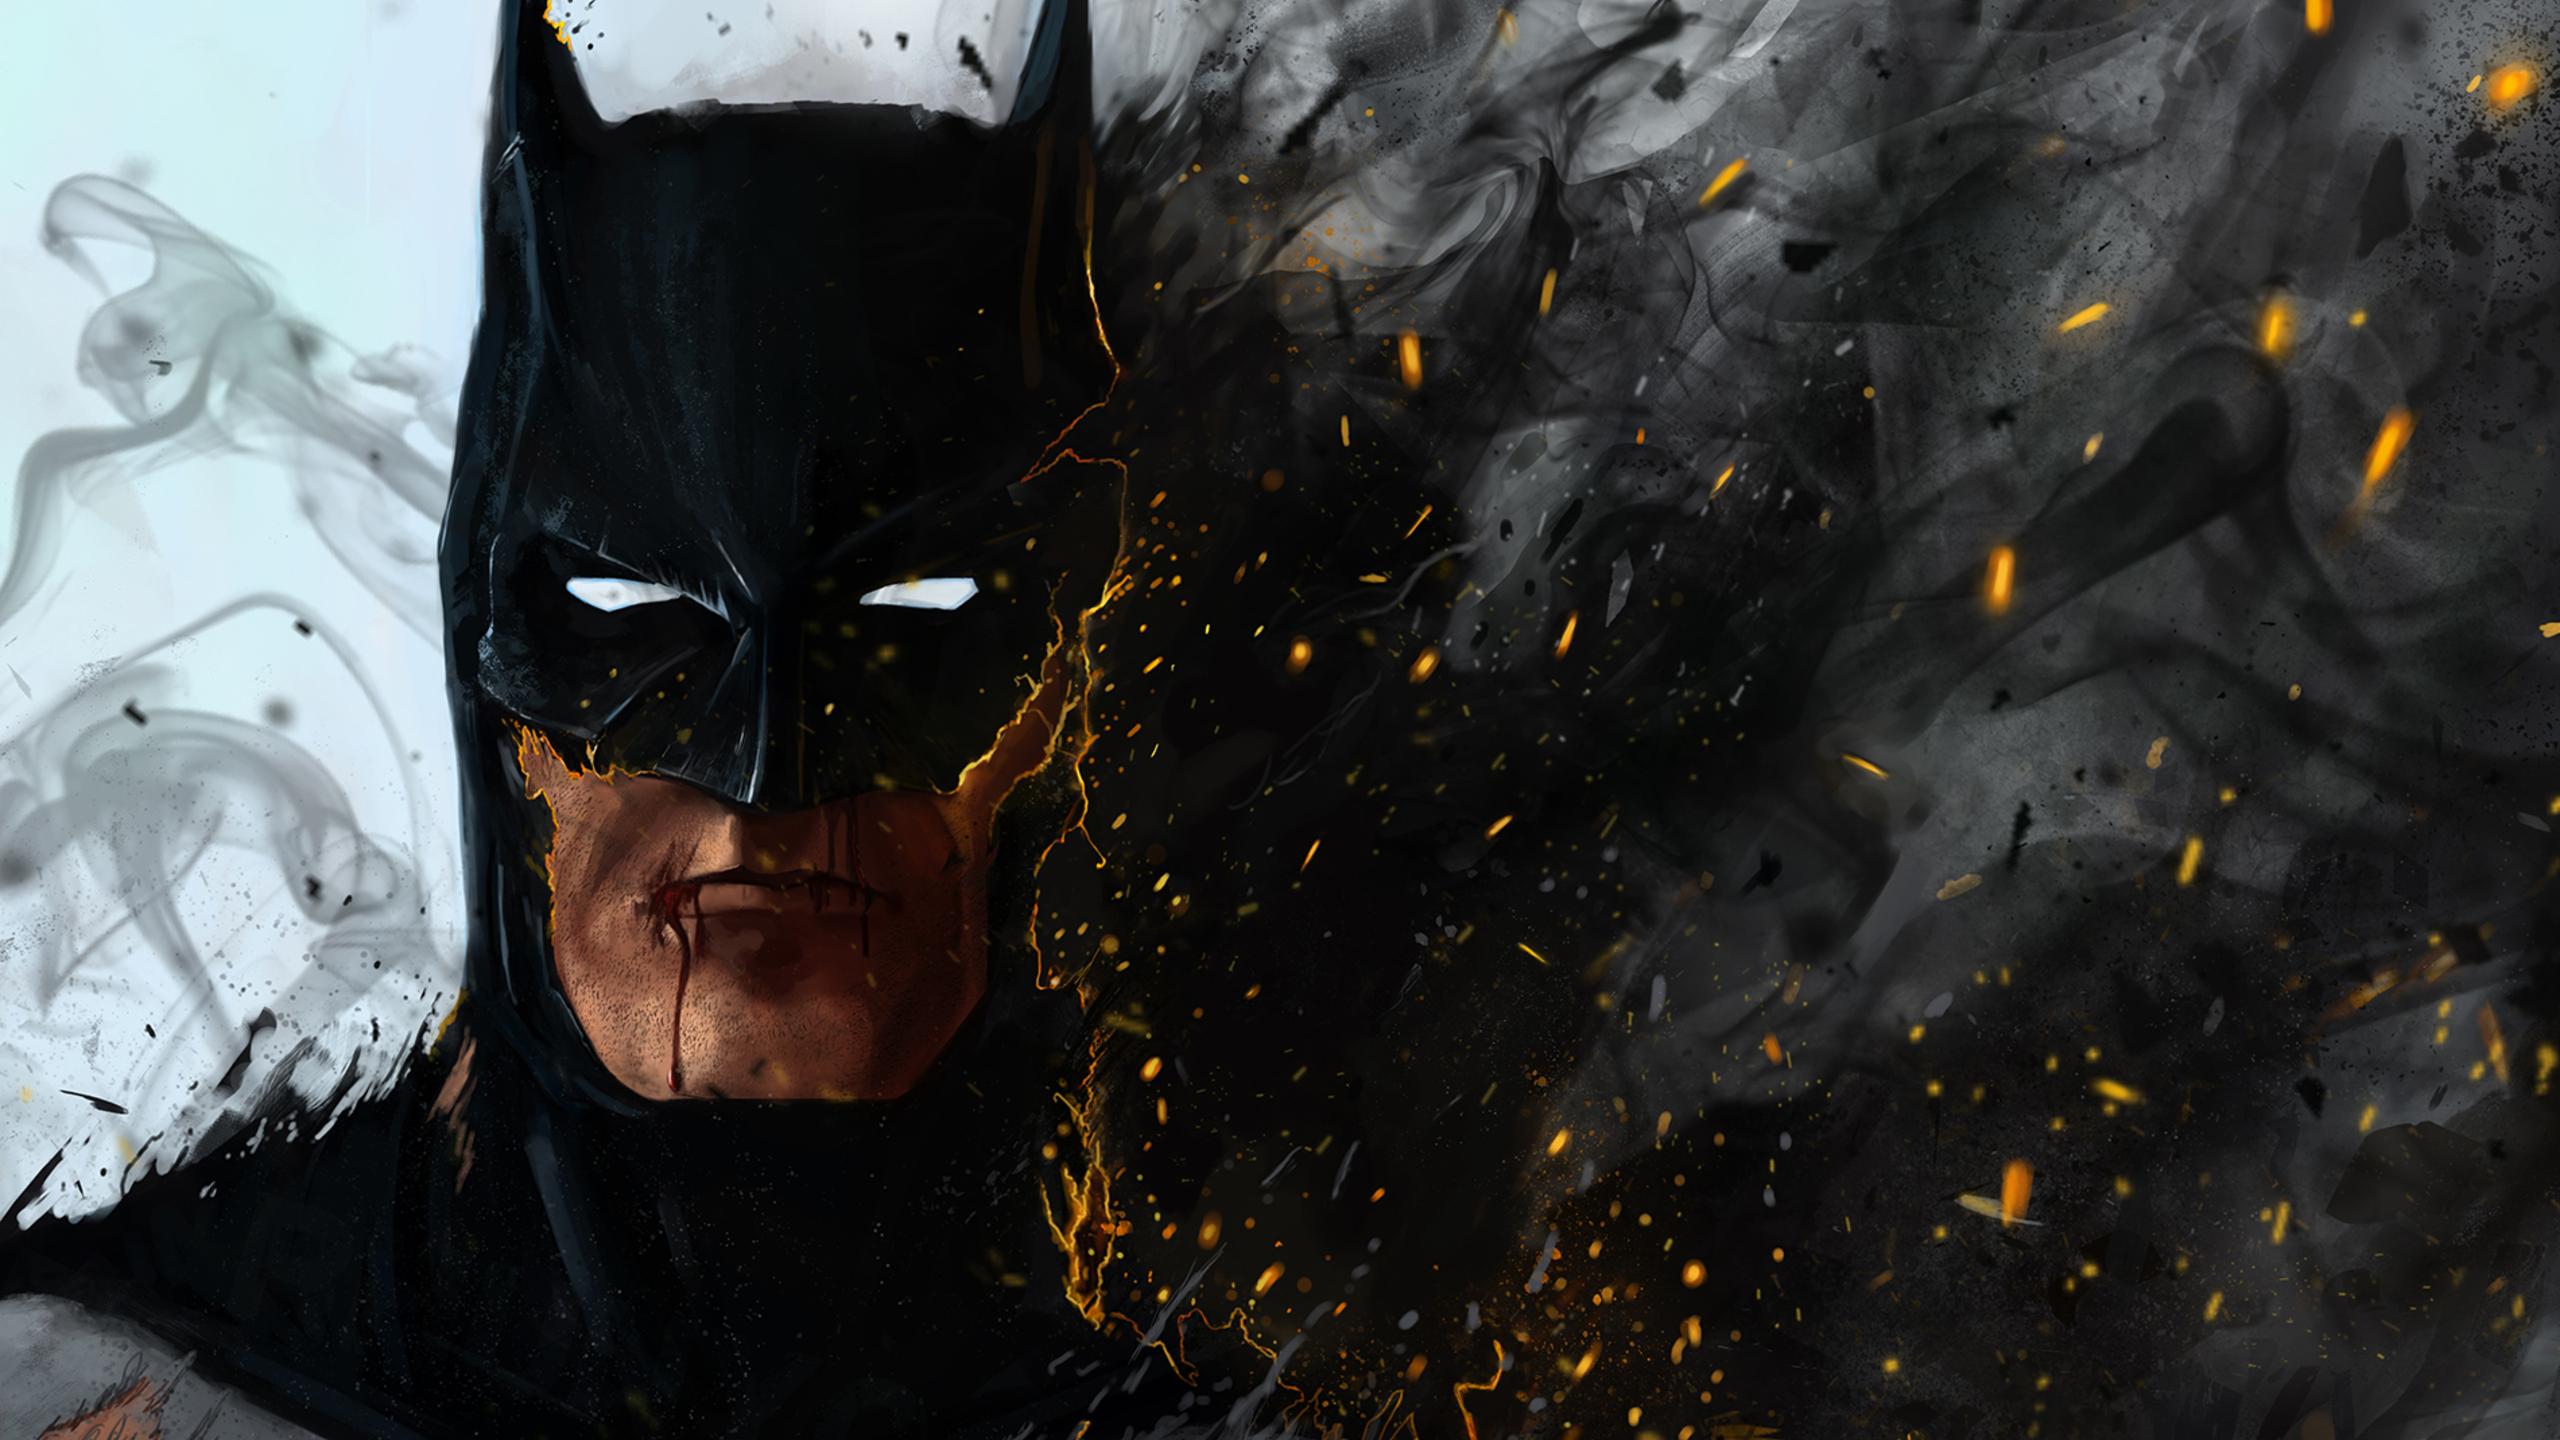 batman-on-fire-kb.jpg